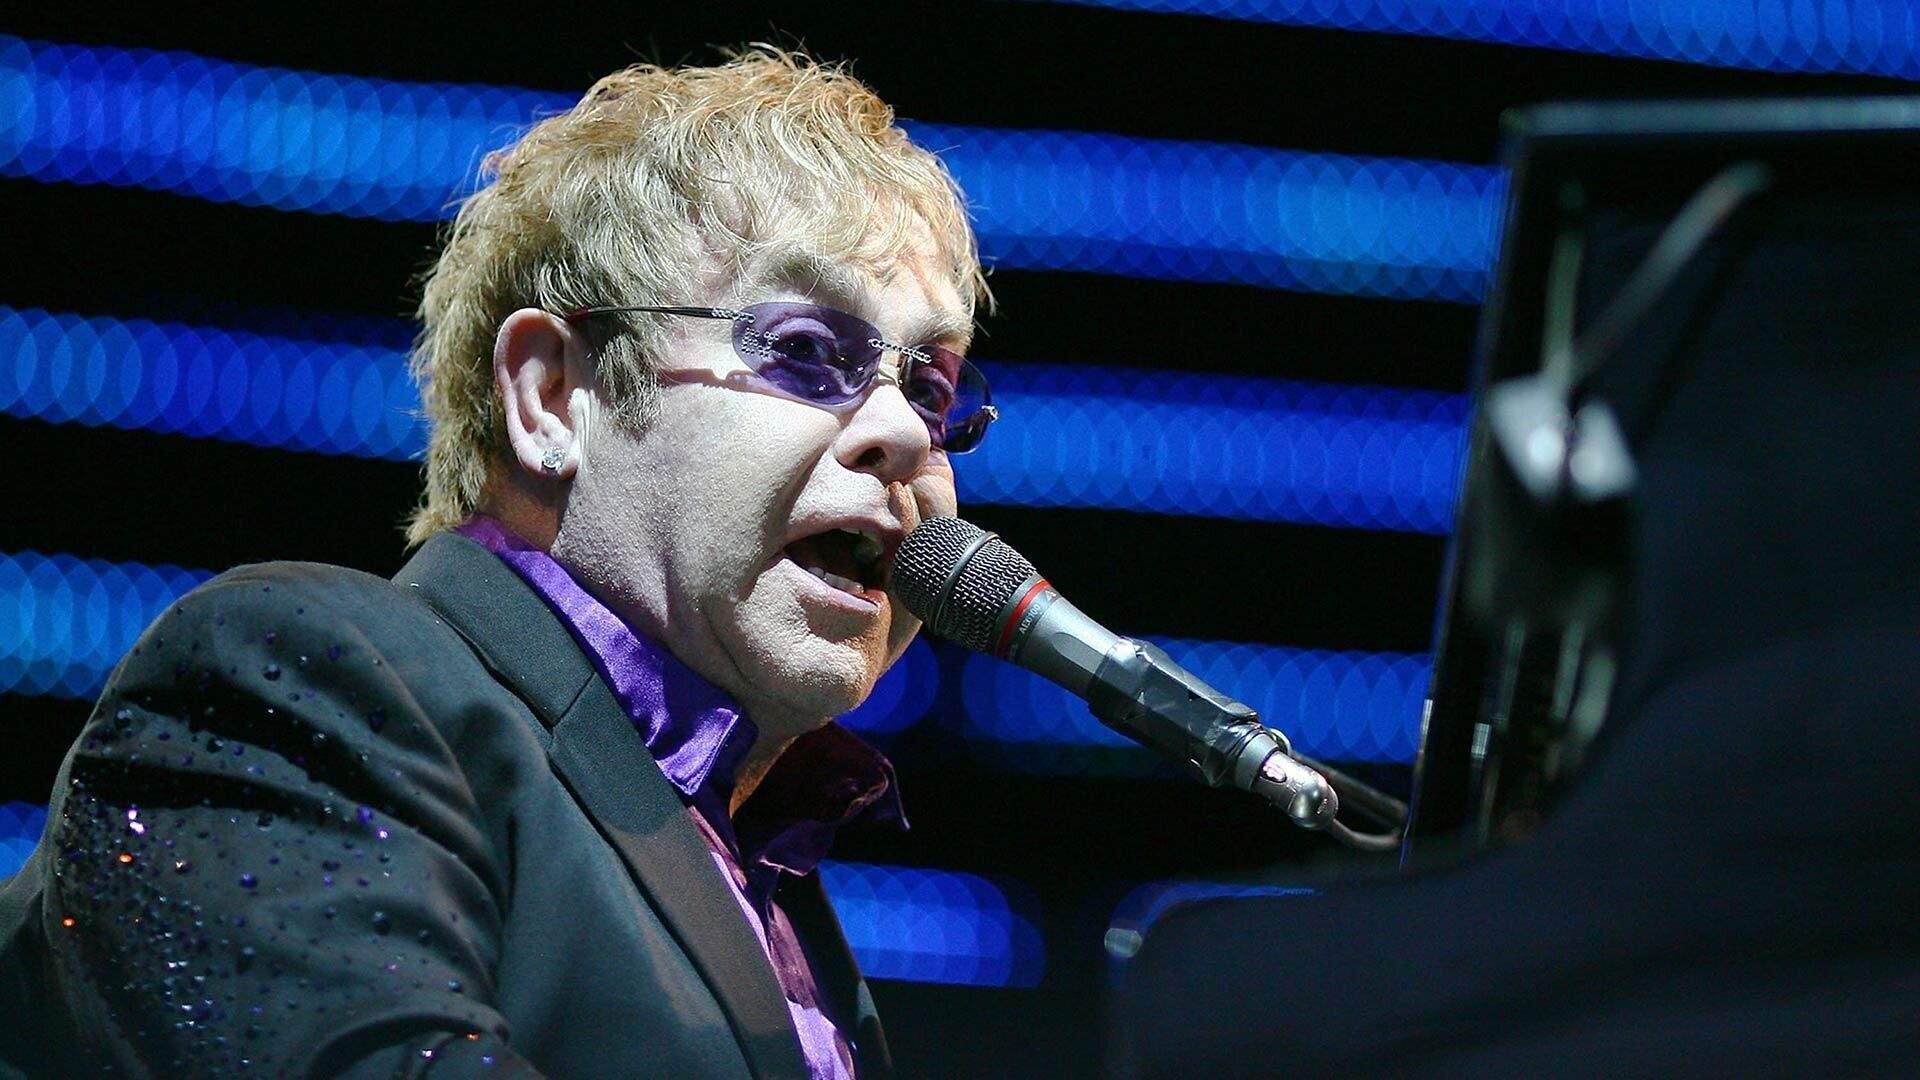 Elton John: Video Killed The Radio Star